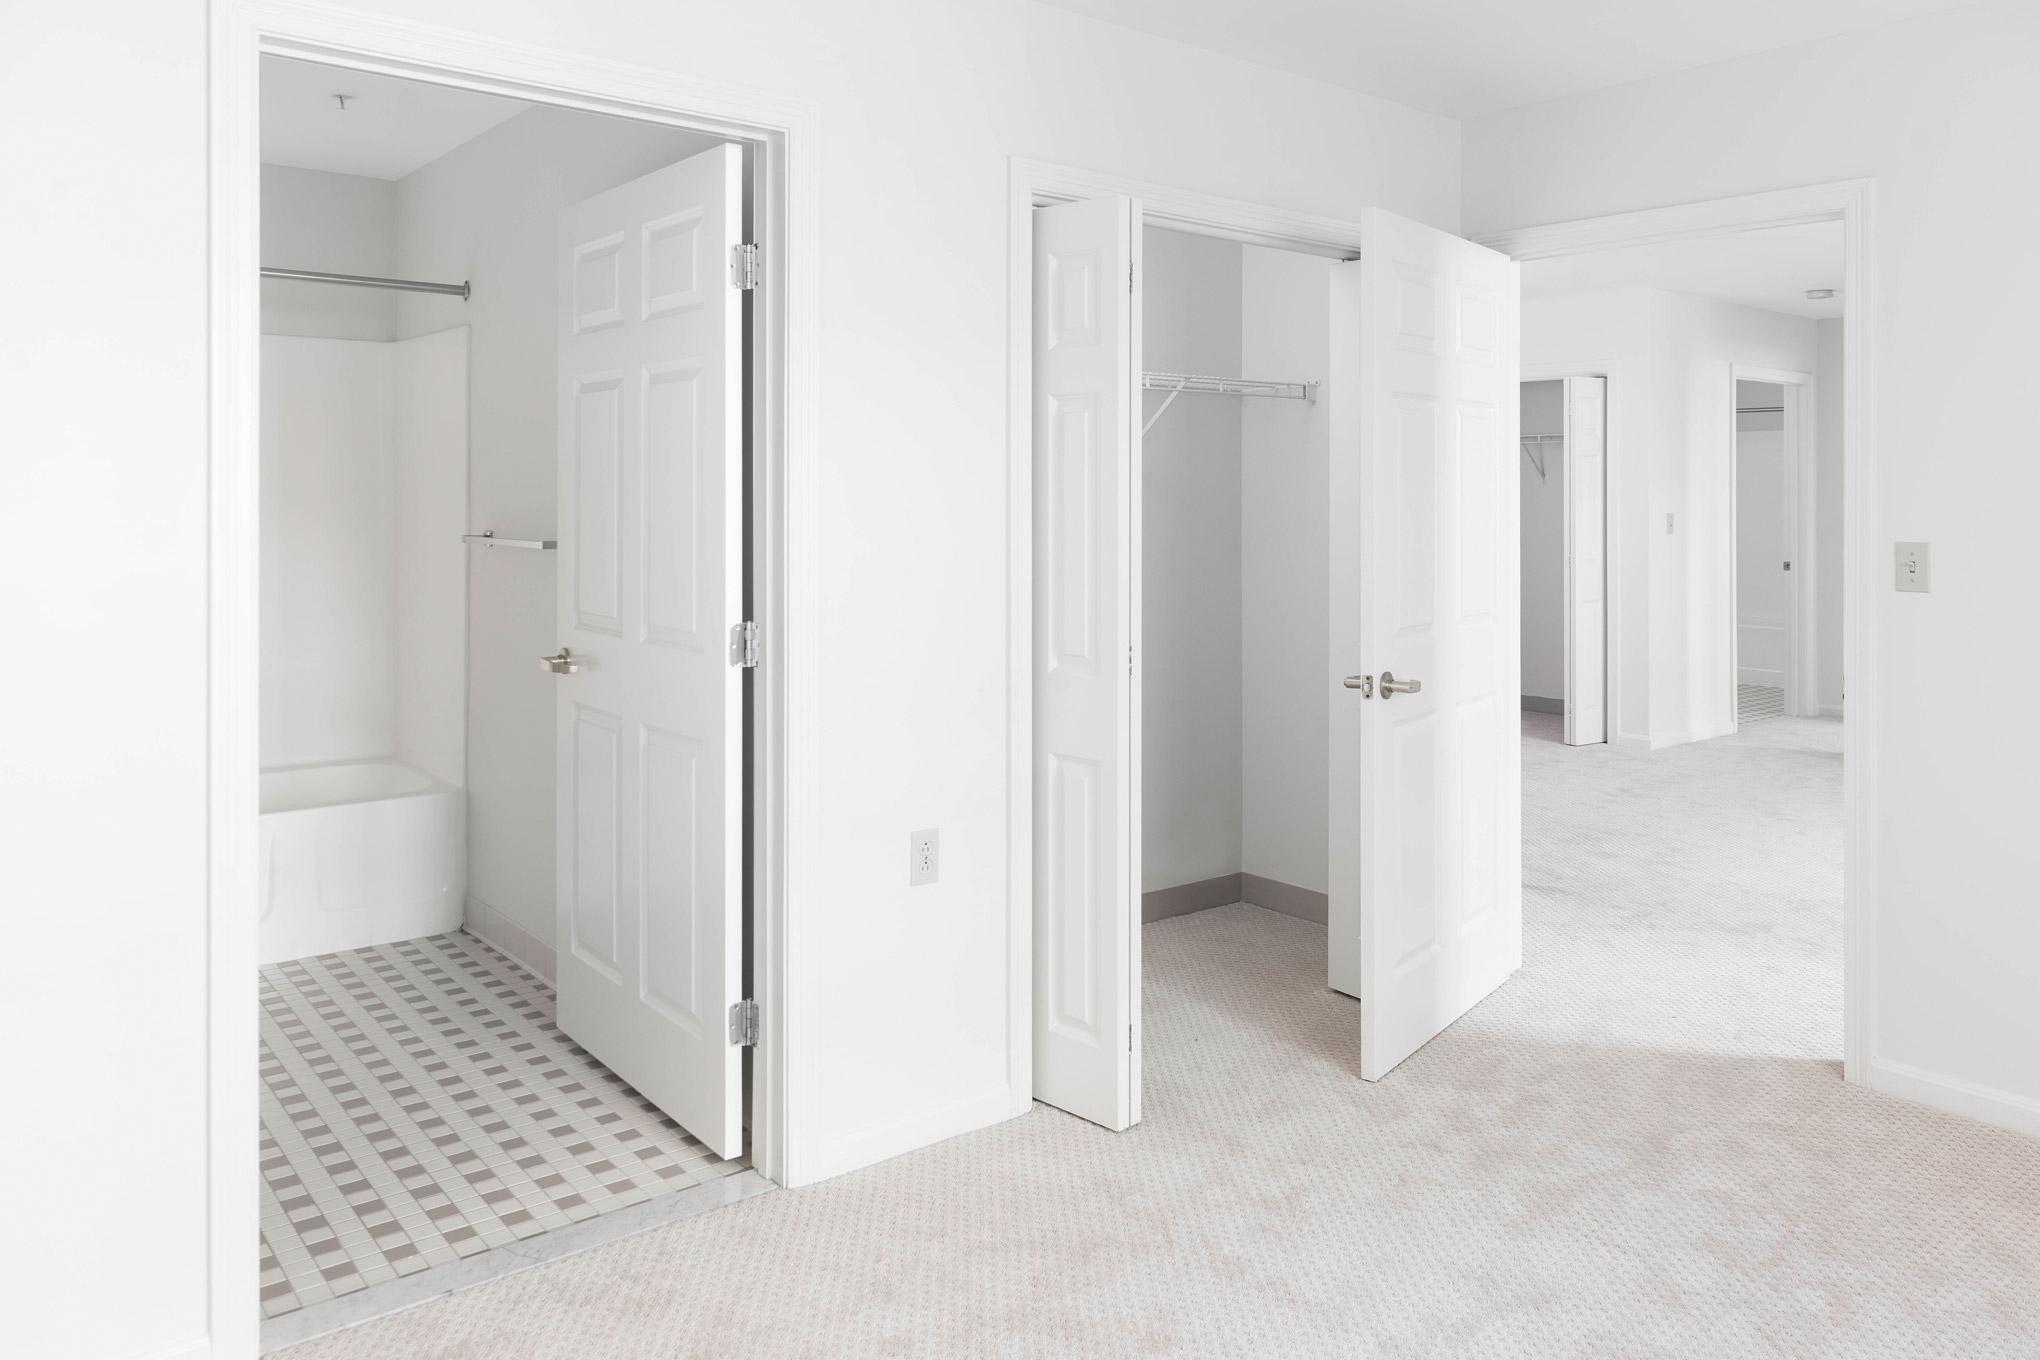 apartment-bedroom-2.jpg